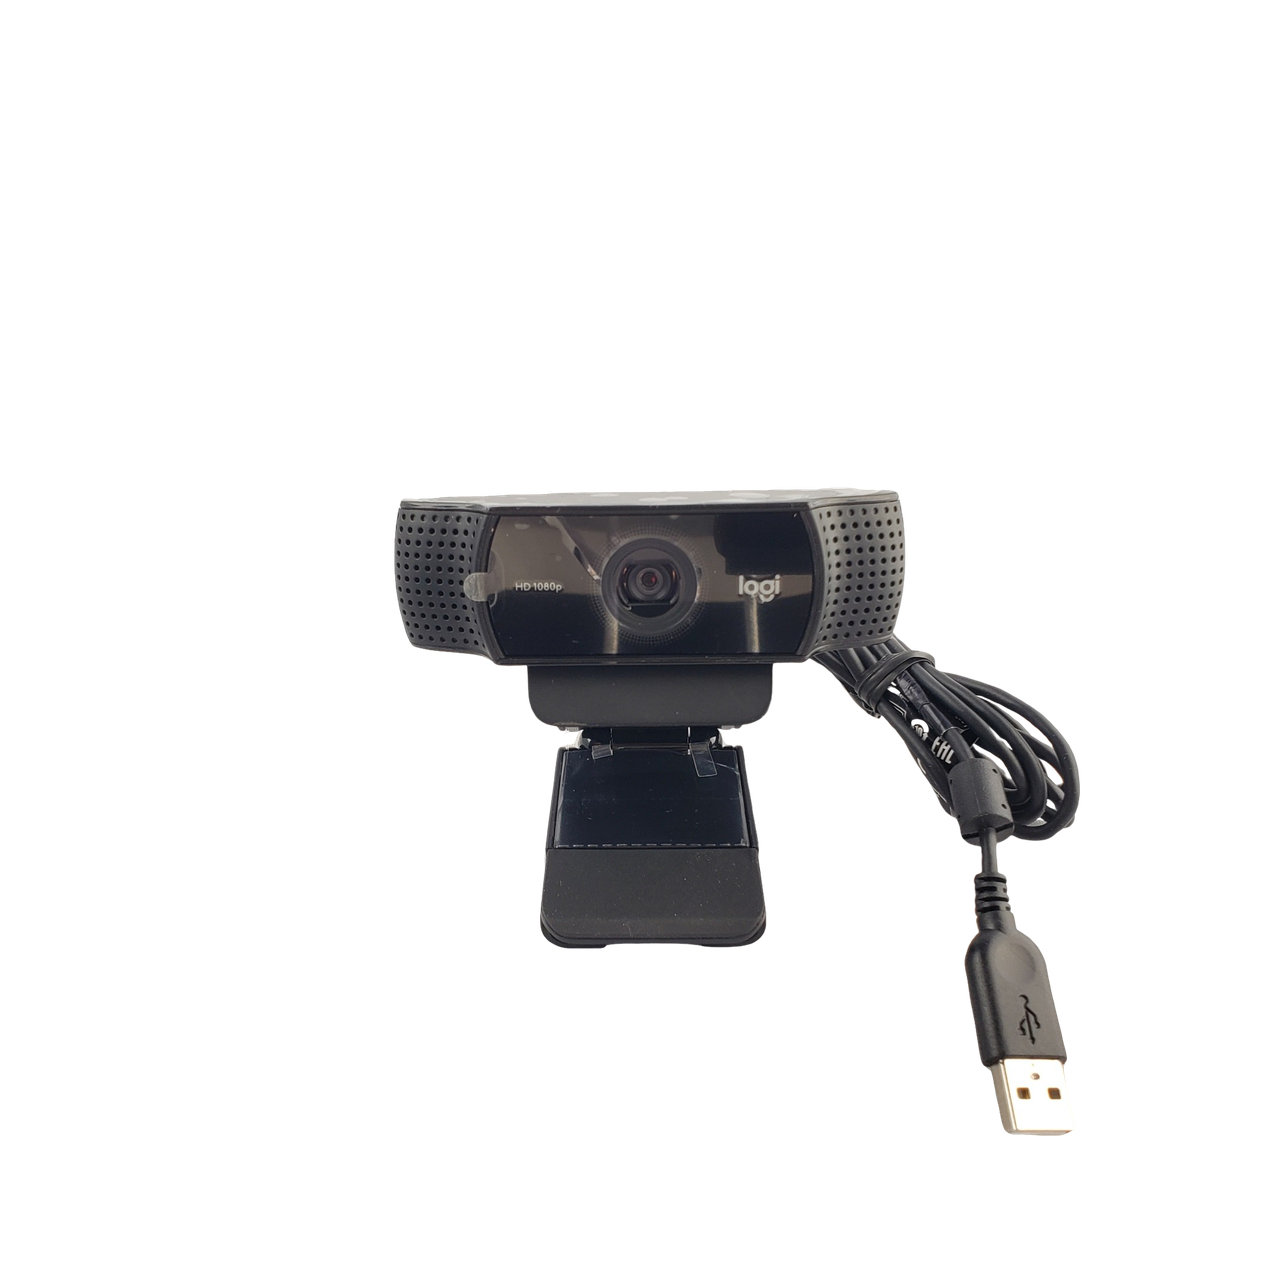 Logitech C922x Pro Stream Webcam Black Grade B2 Refurdished